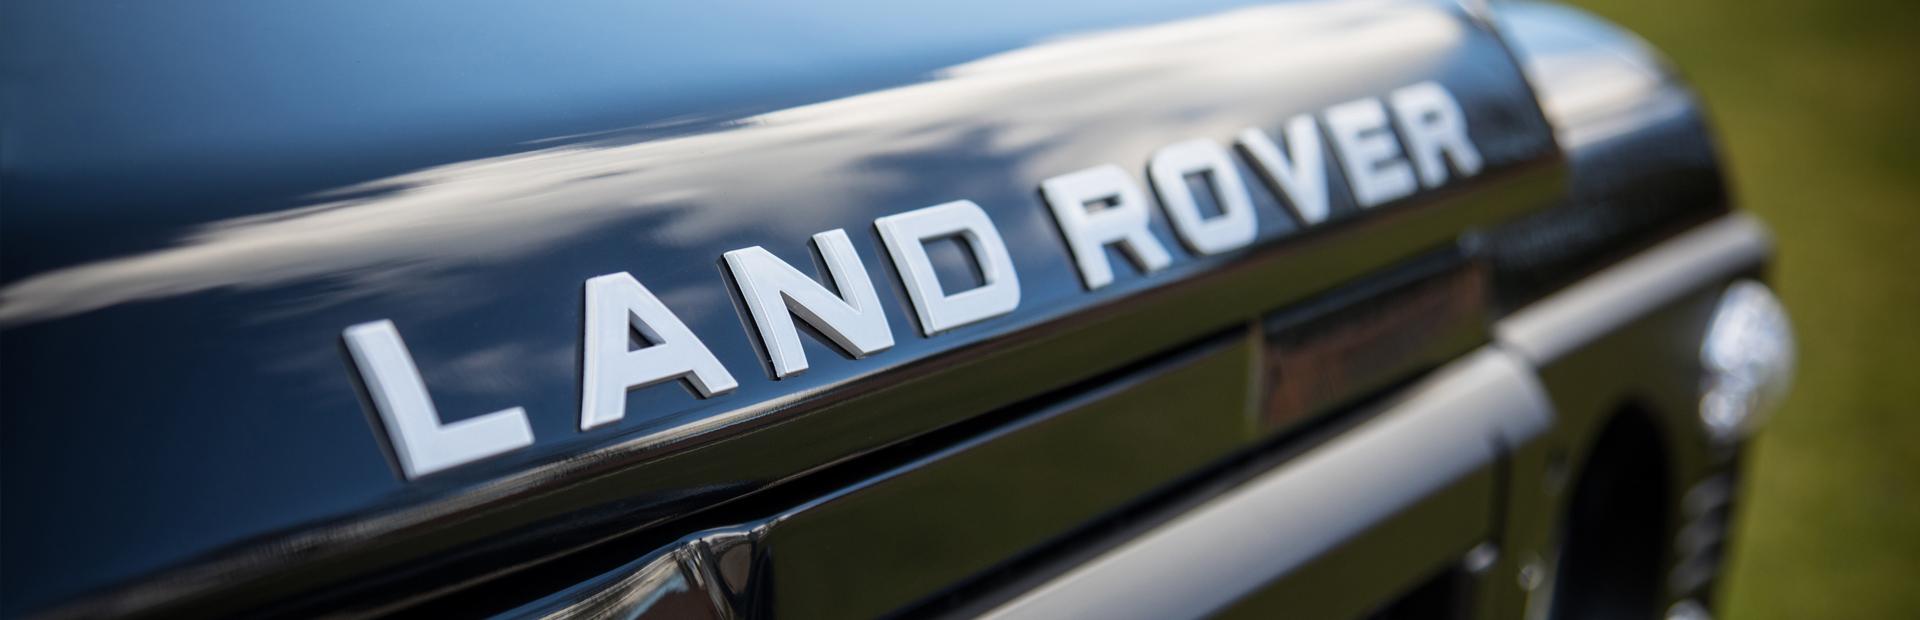 Arkonik Duke - Custom built Land Rover Defender 110